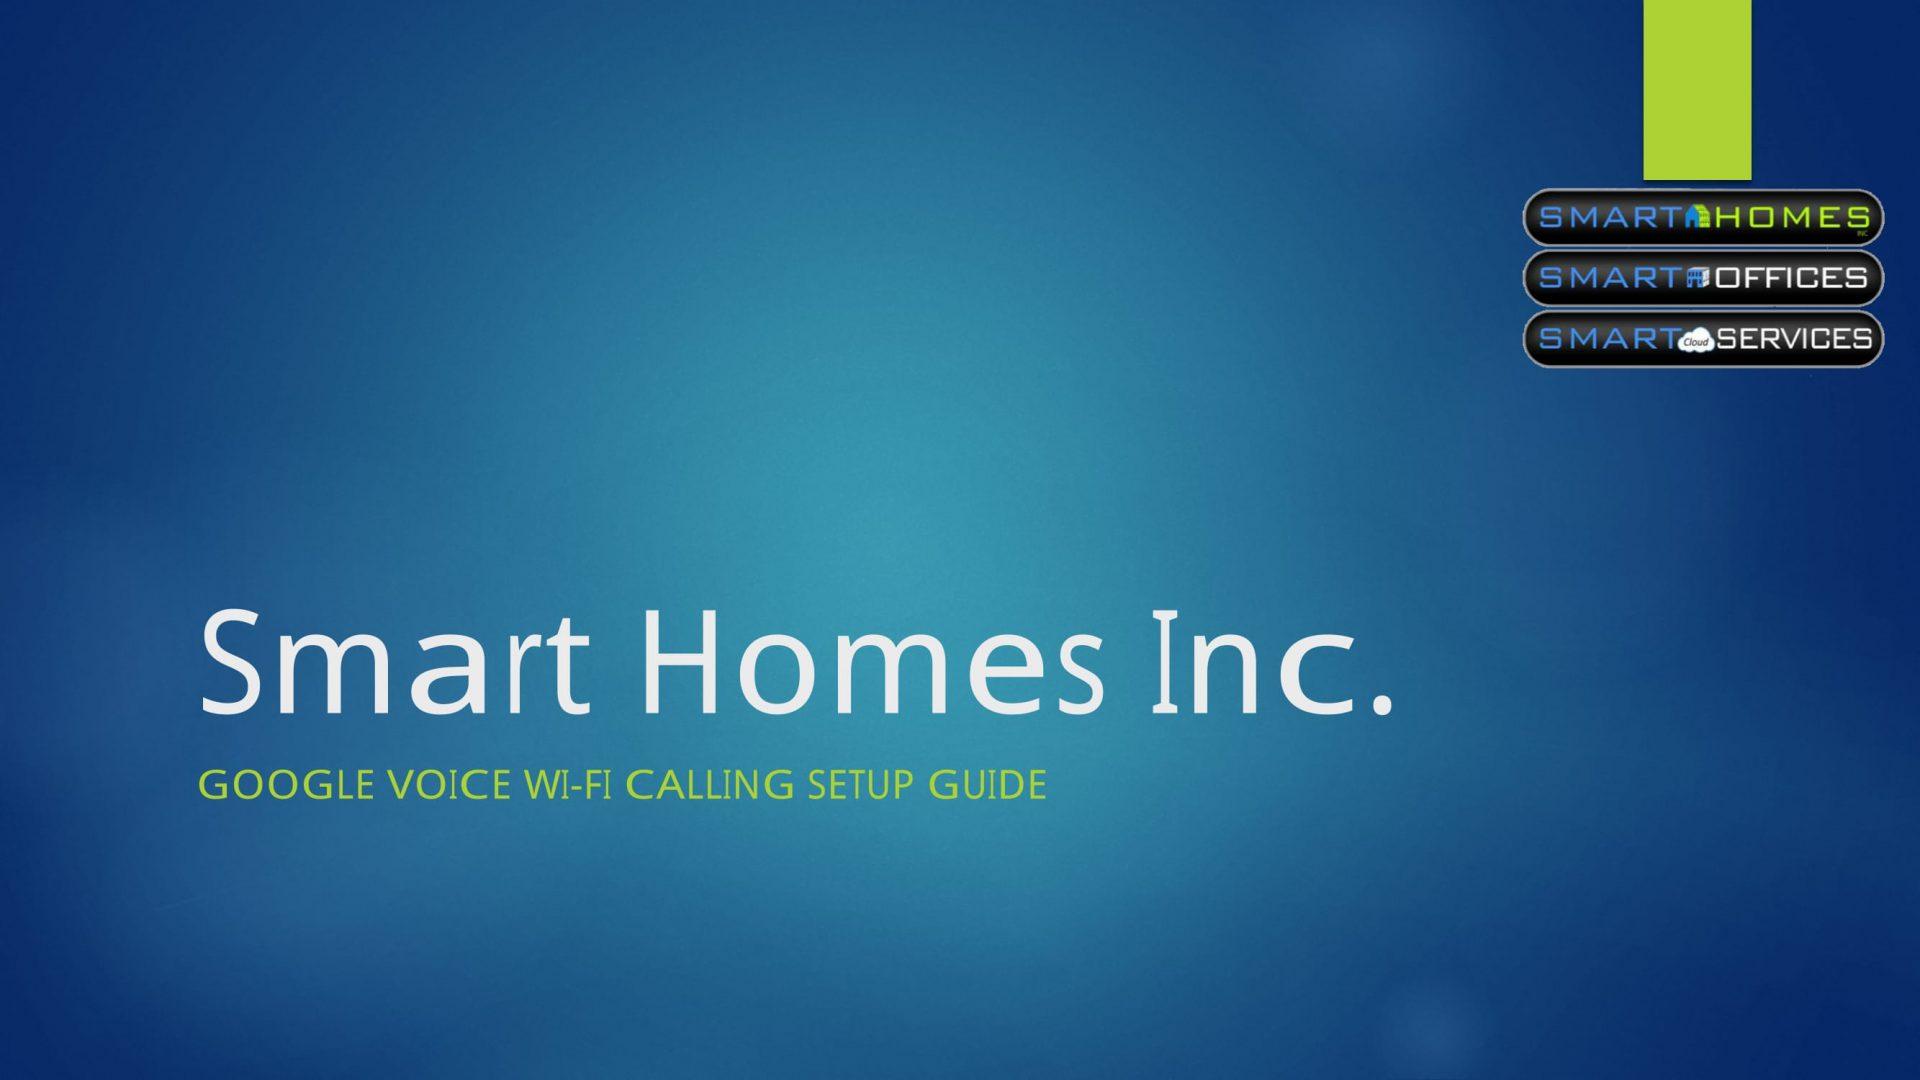 Smart Homes Inc Google Voice Guide-01